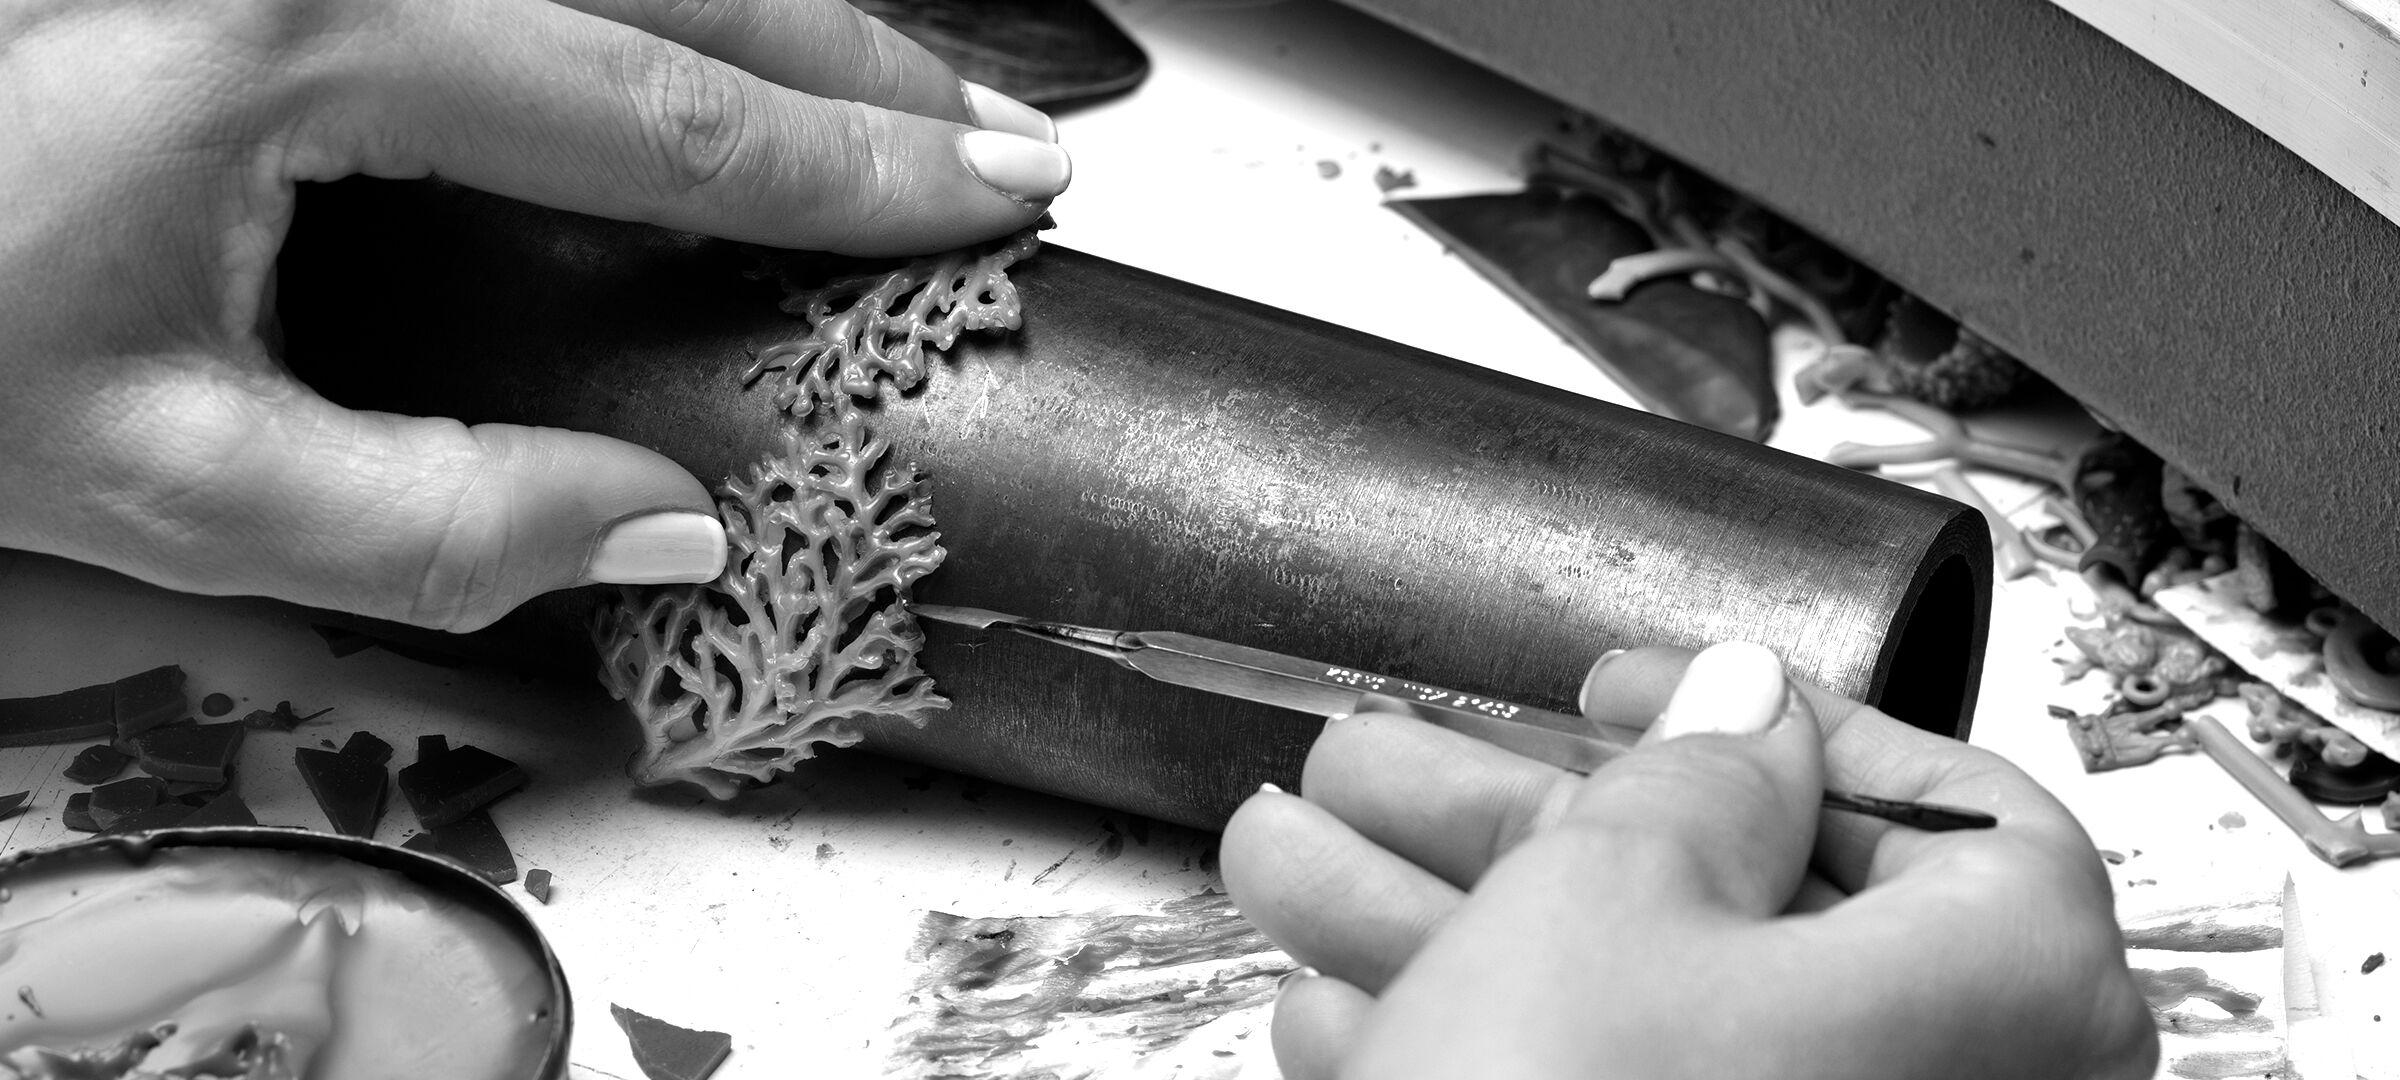 Craftmanship and Techniques